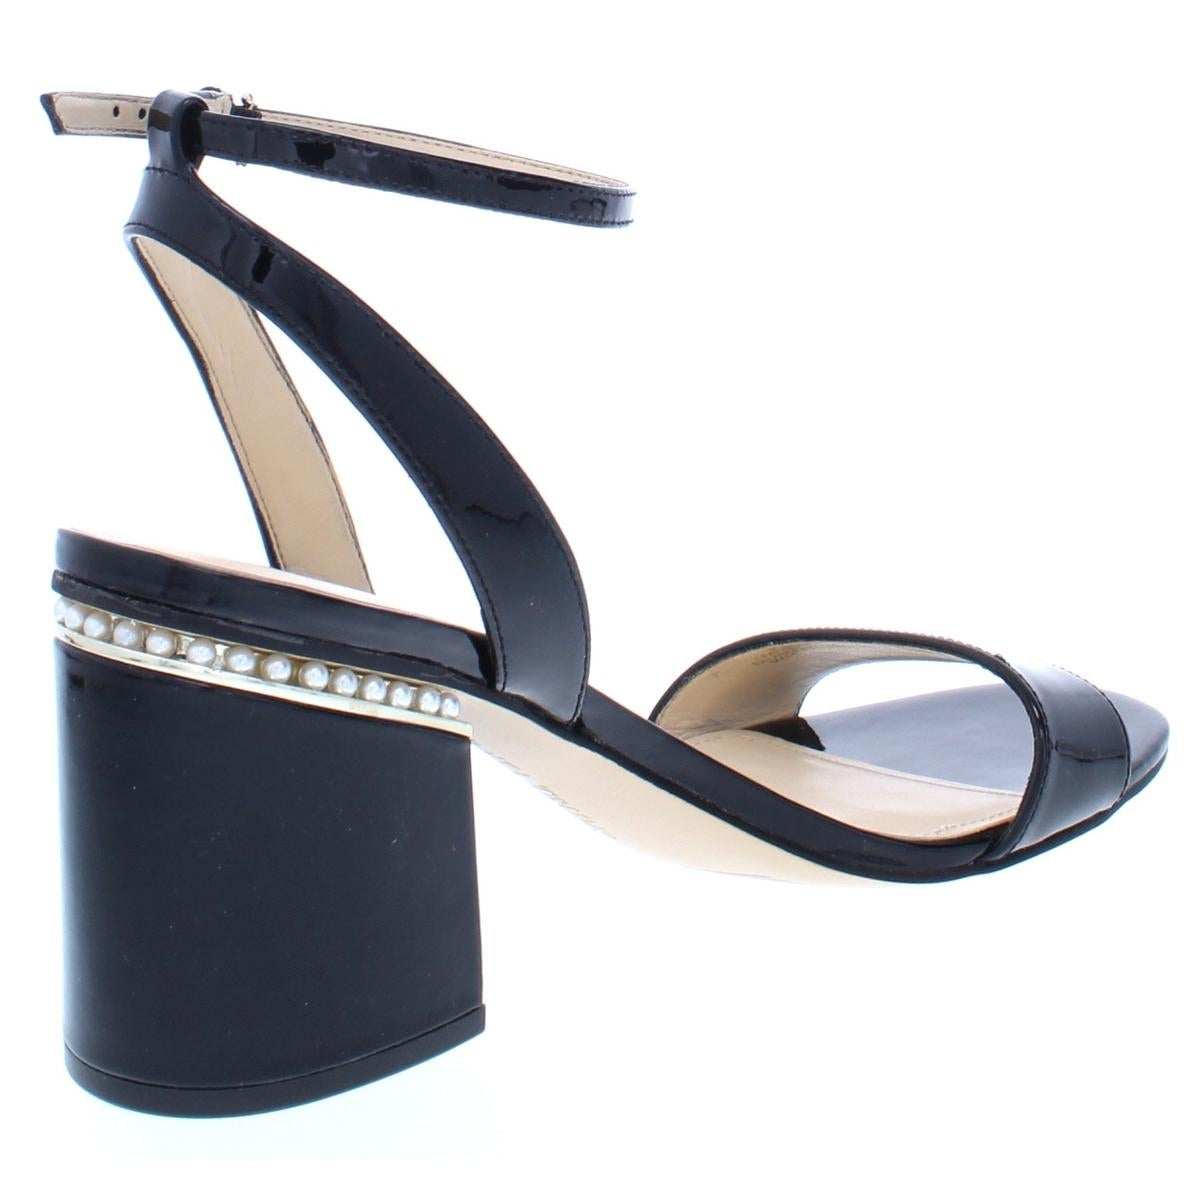 7921879f342 Shop Ivanka Trump Womens Anina Dress Sandals Patent Leather Block Heel -  Free Shipping Today - Overstock - 27080146